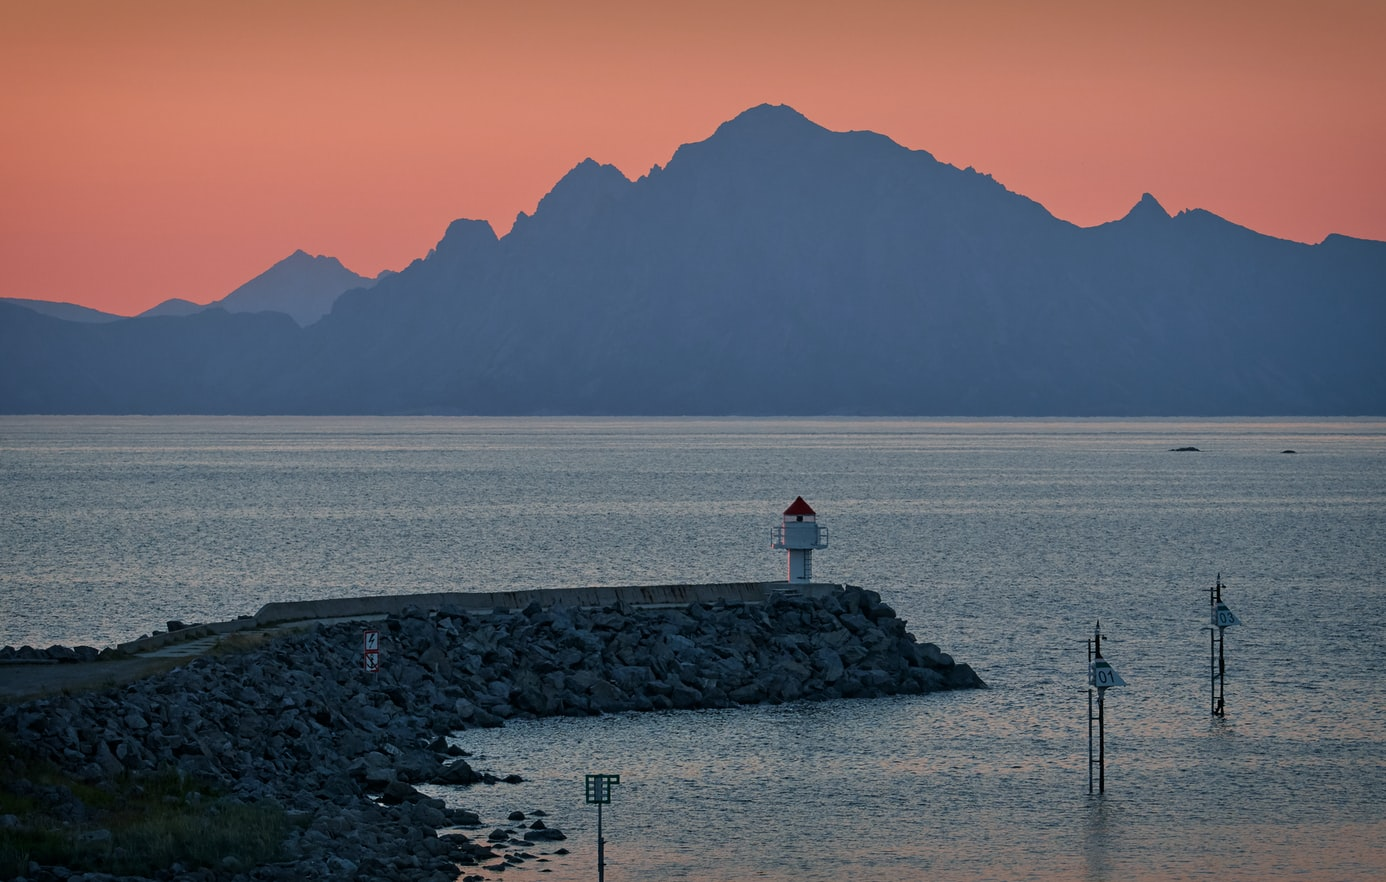 Unntak for lasteskip frå reglane om lokal forureining i verdsarvfjordane